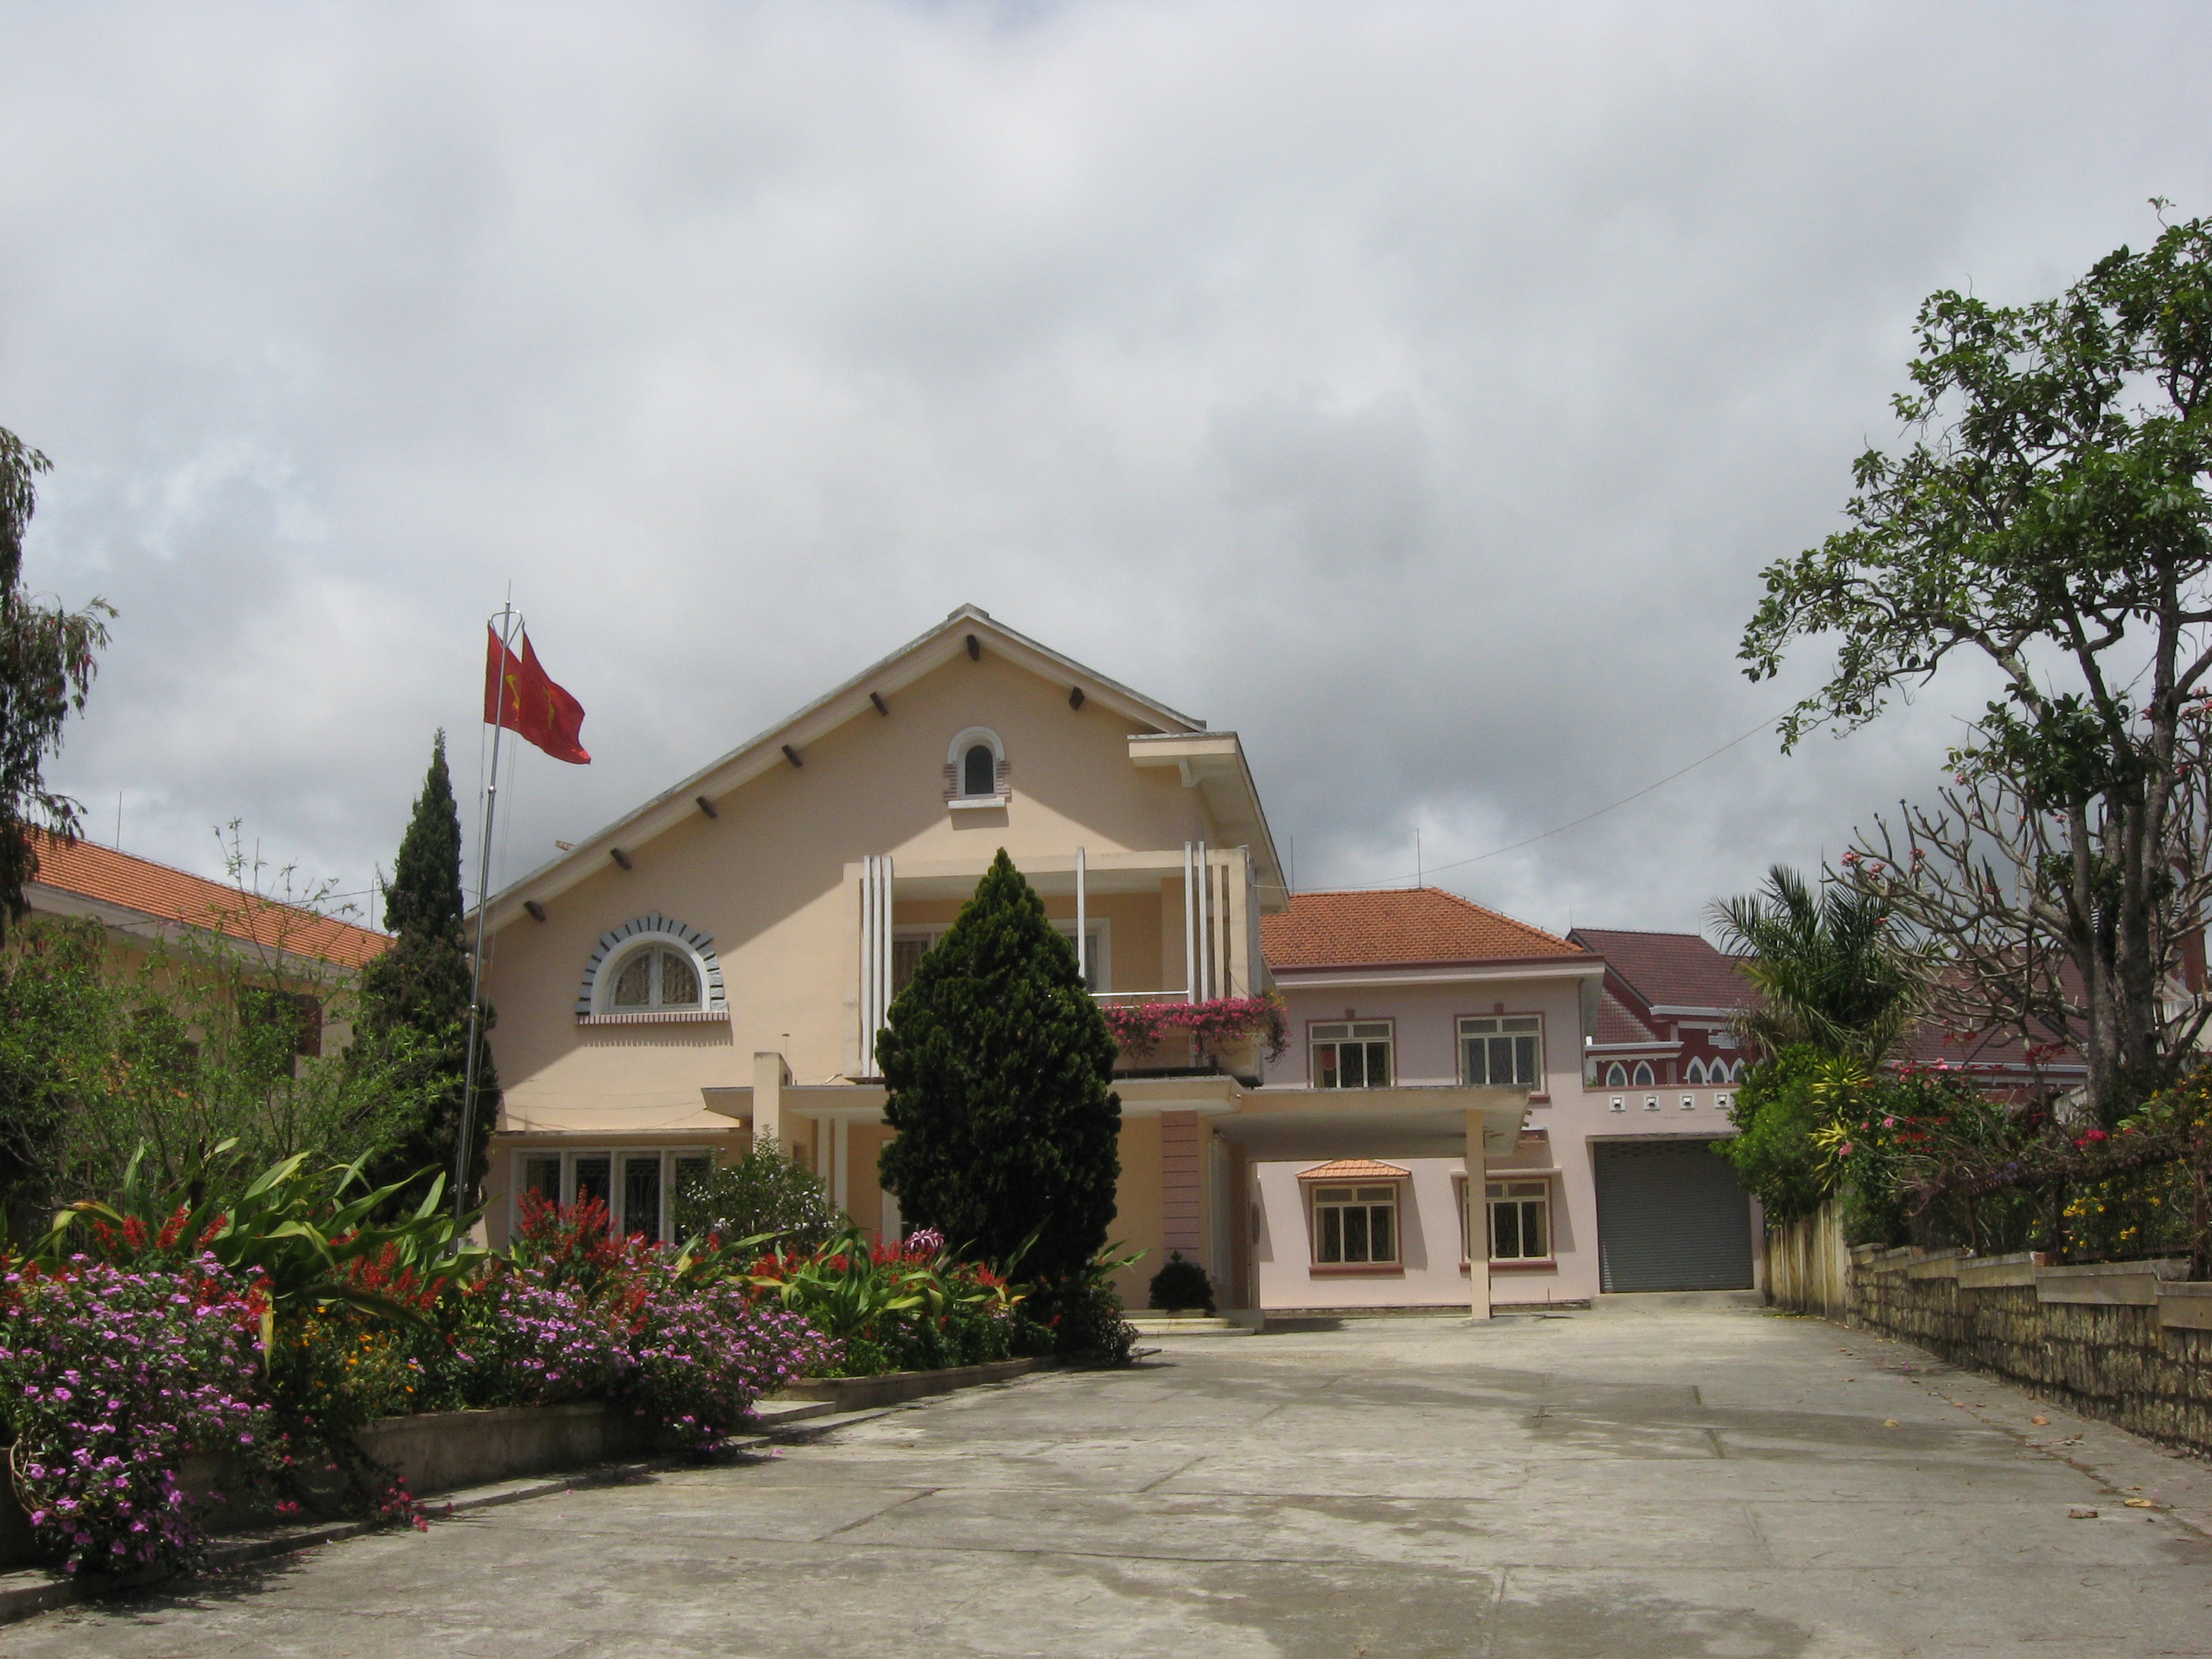 http://upload.wikimedia.org/wikipedia/commons/2/27/Villa,_31B_Quang_Trung_Street,_Da_Lat.JPG